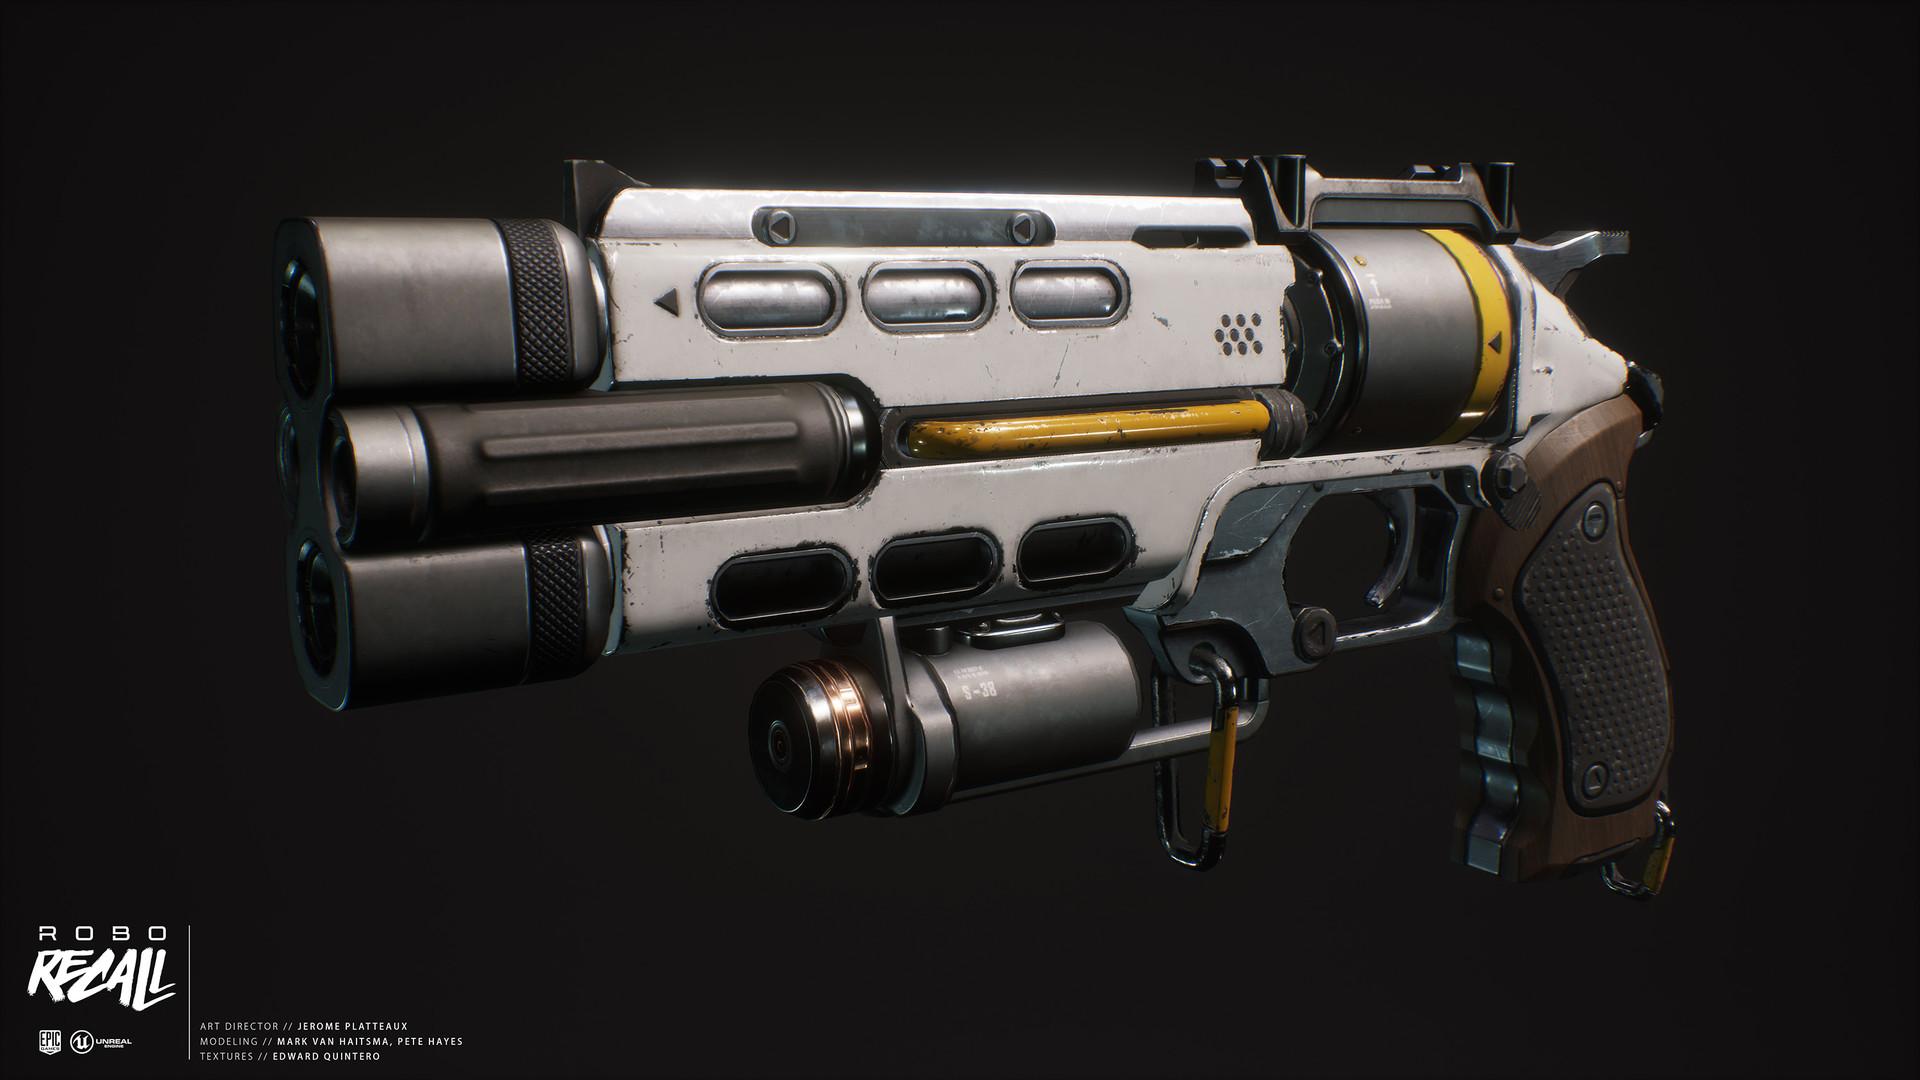 Mark van haitsma revolver 03